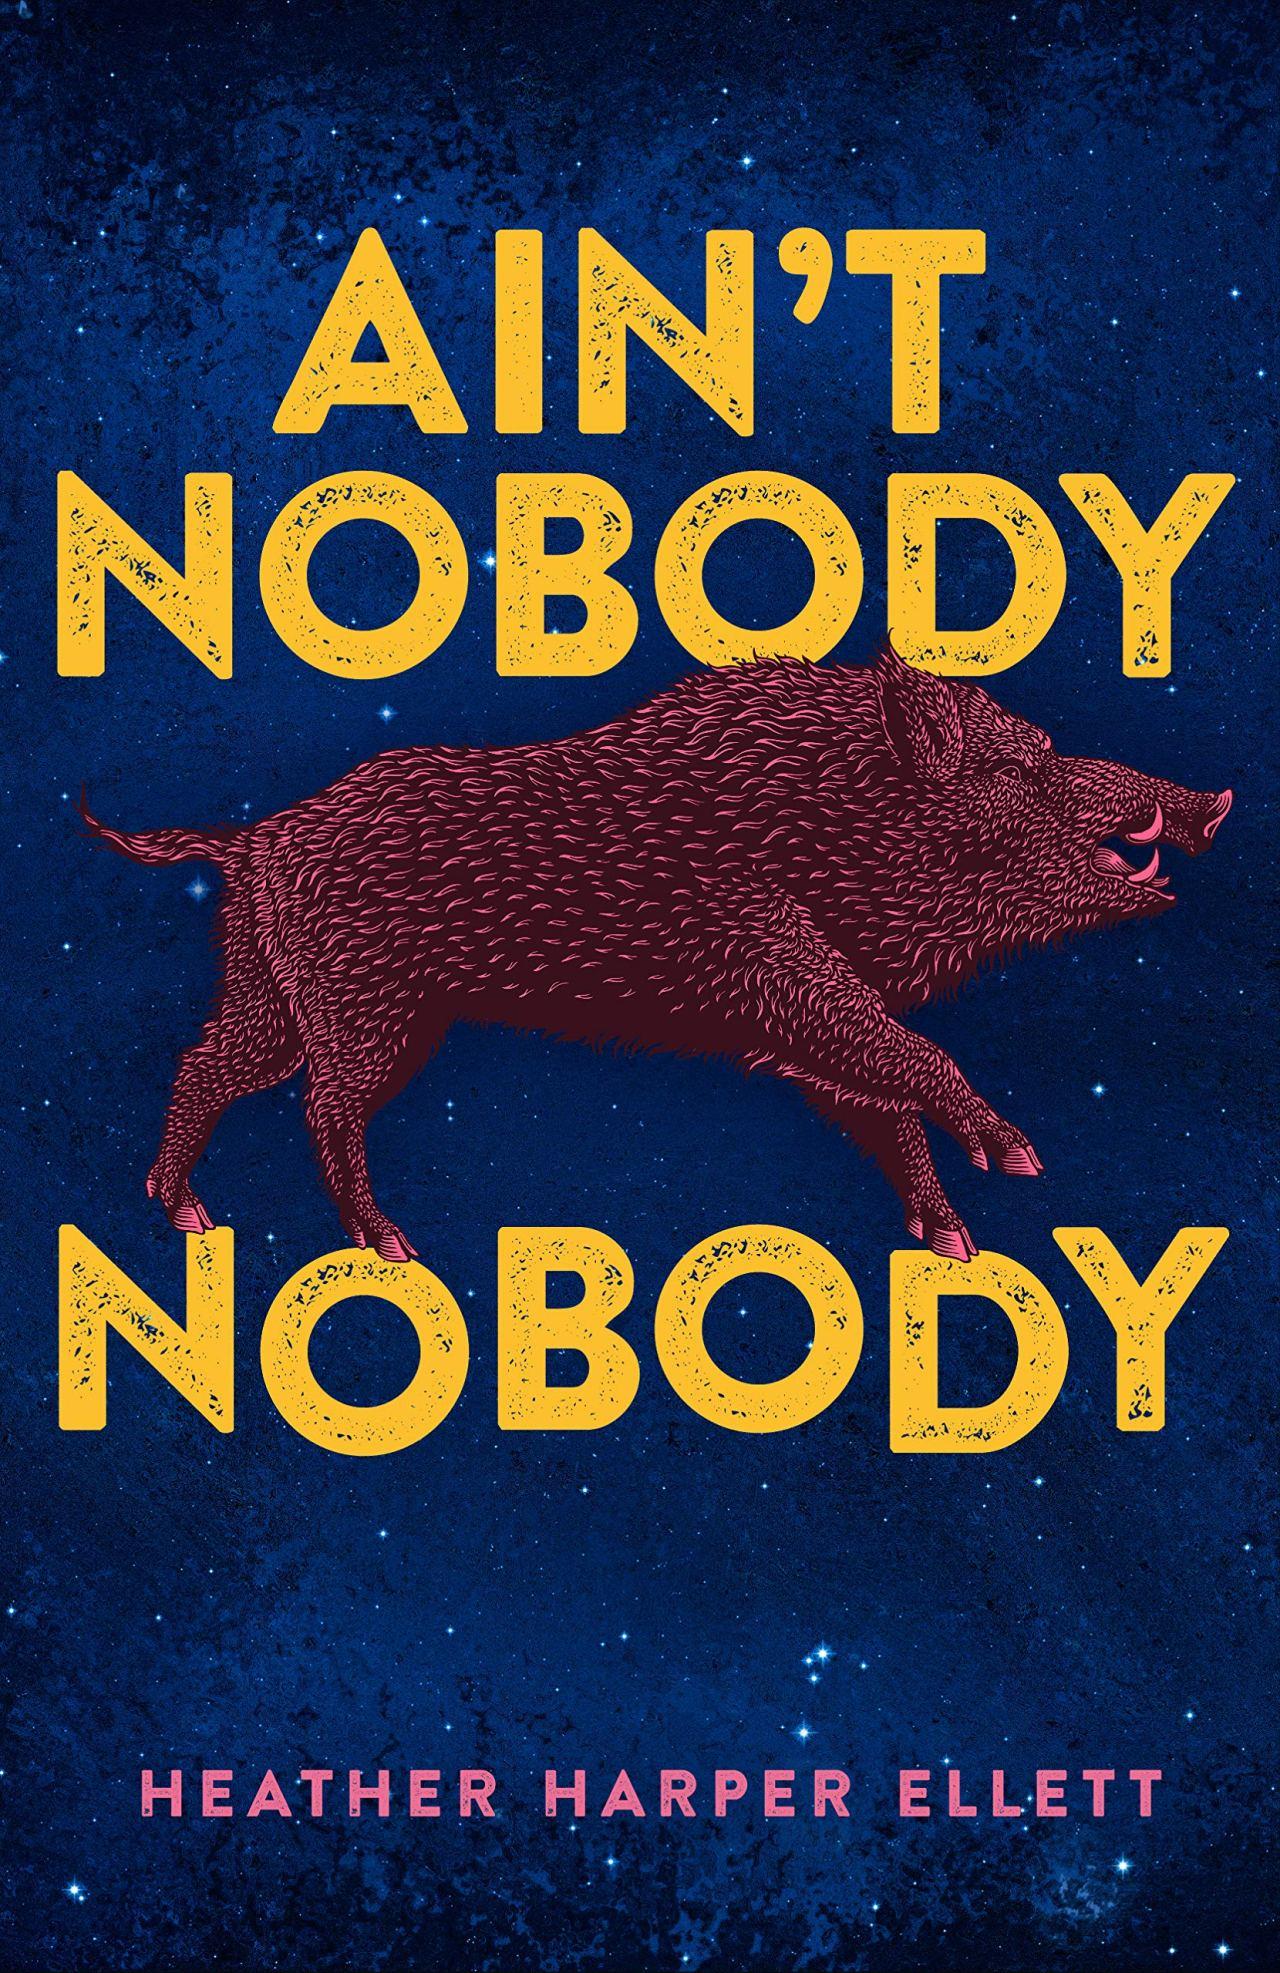 Heather Harper Ellett: Ain't NobodyNobody